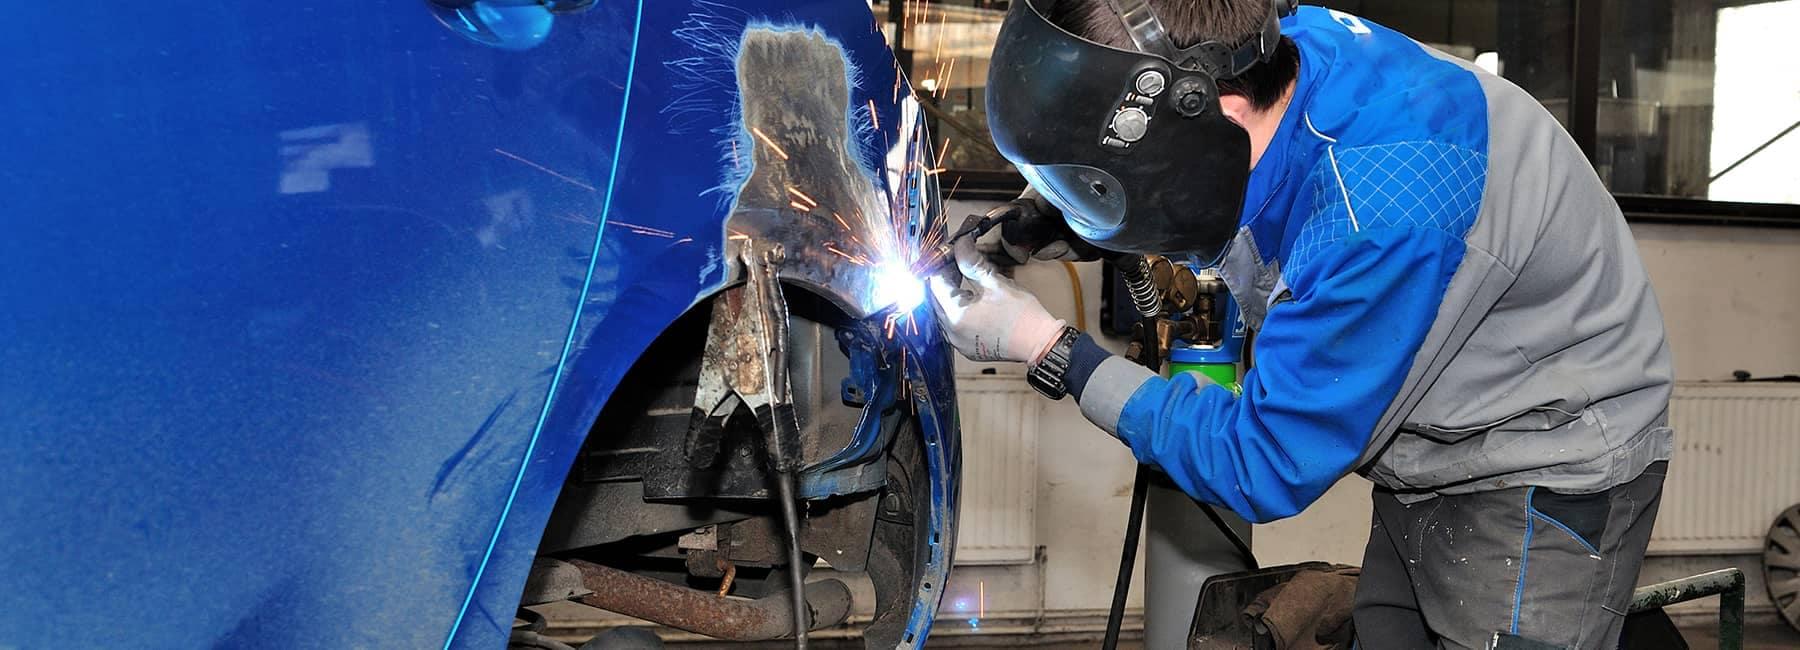 Body_Shop technician welding car bumper